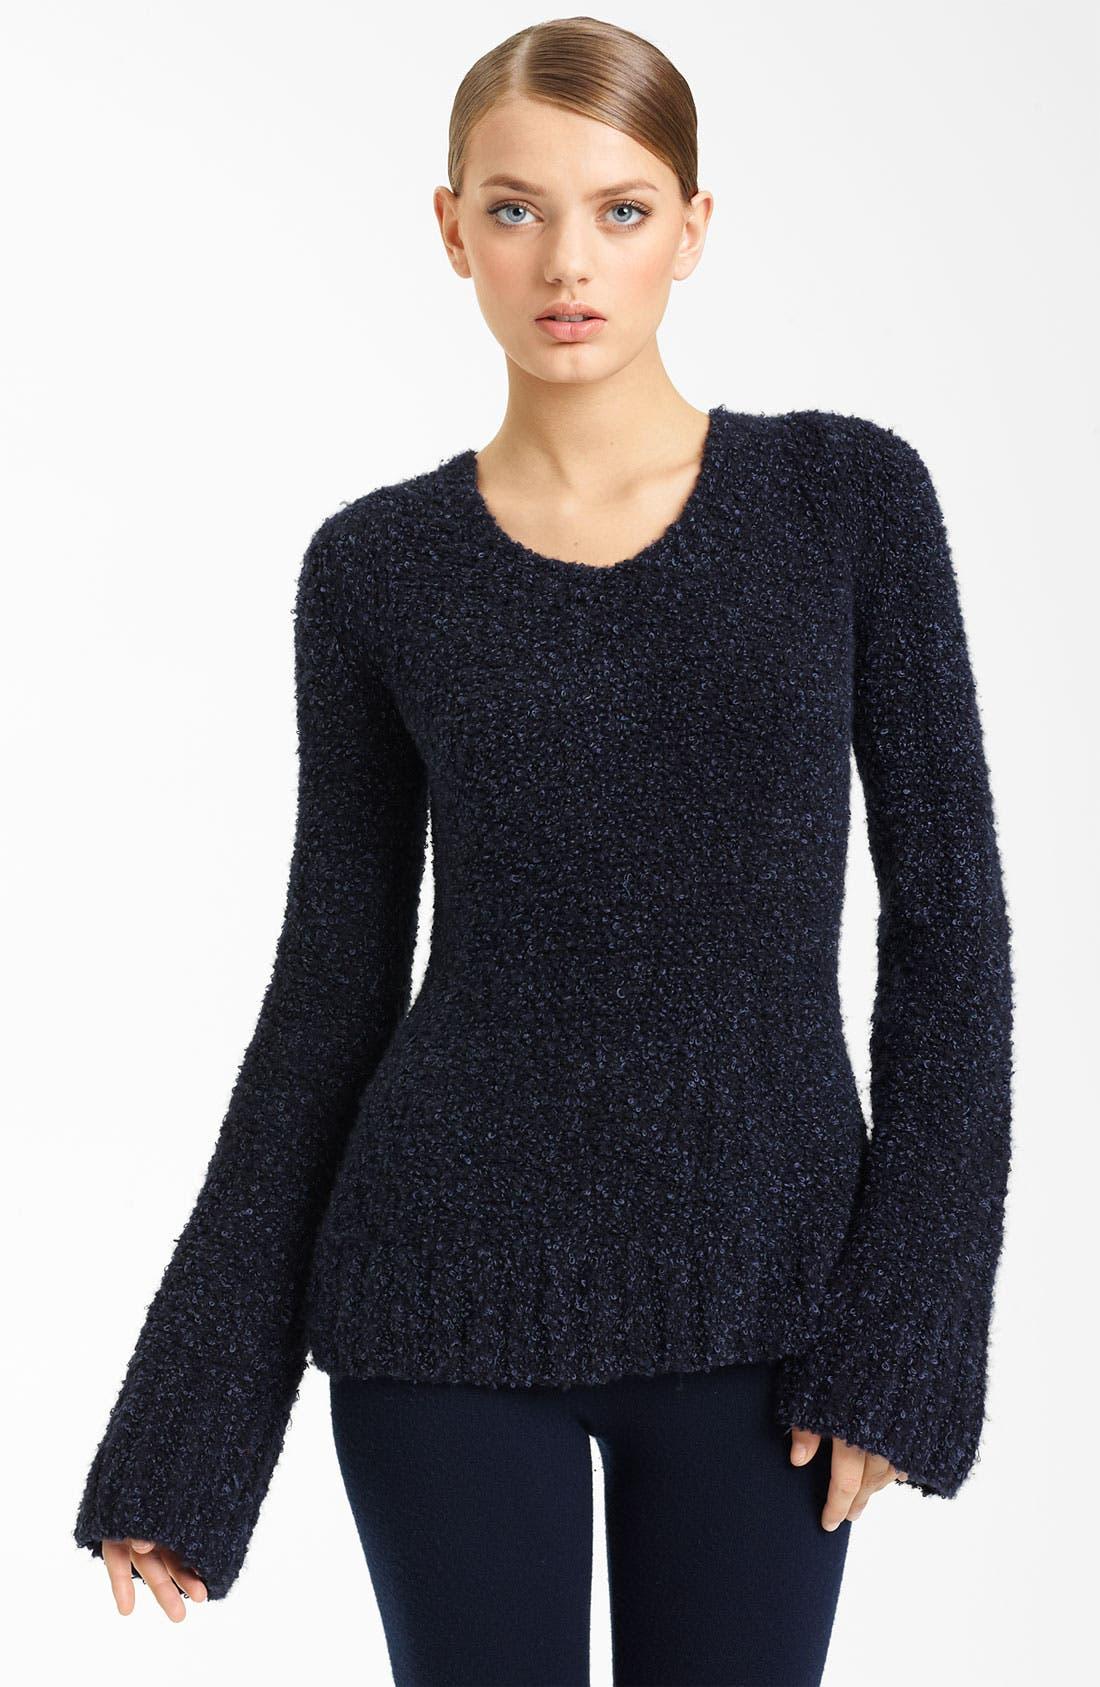 Alternate Image 1 Selected - Donna Karan Collection Bouclé Cashmere Sweater